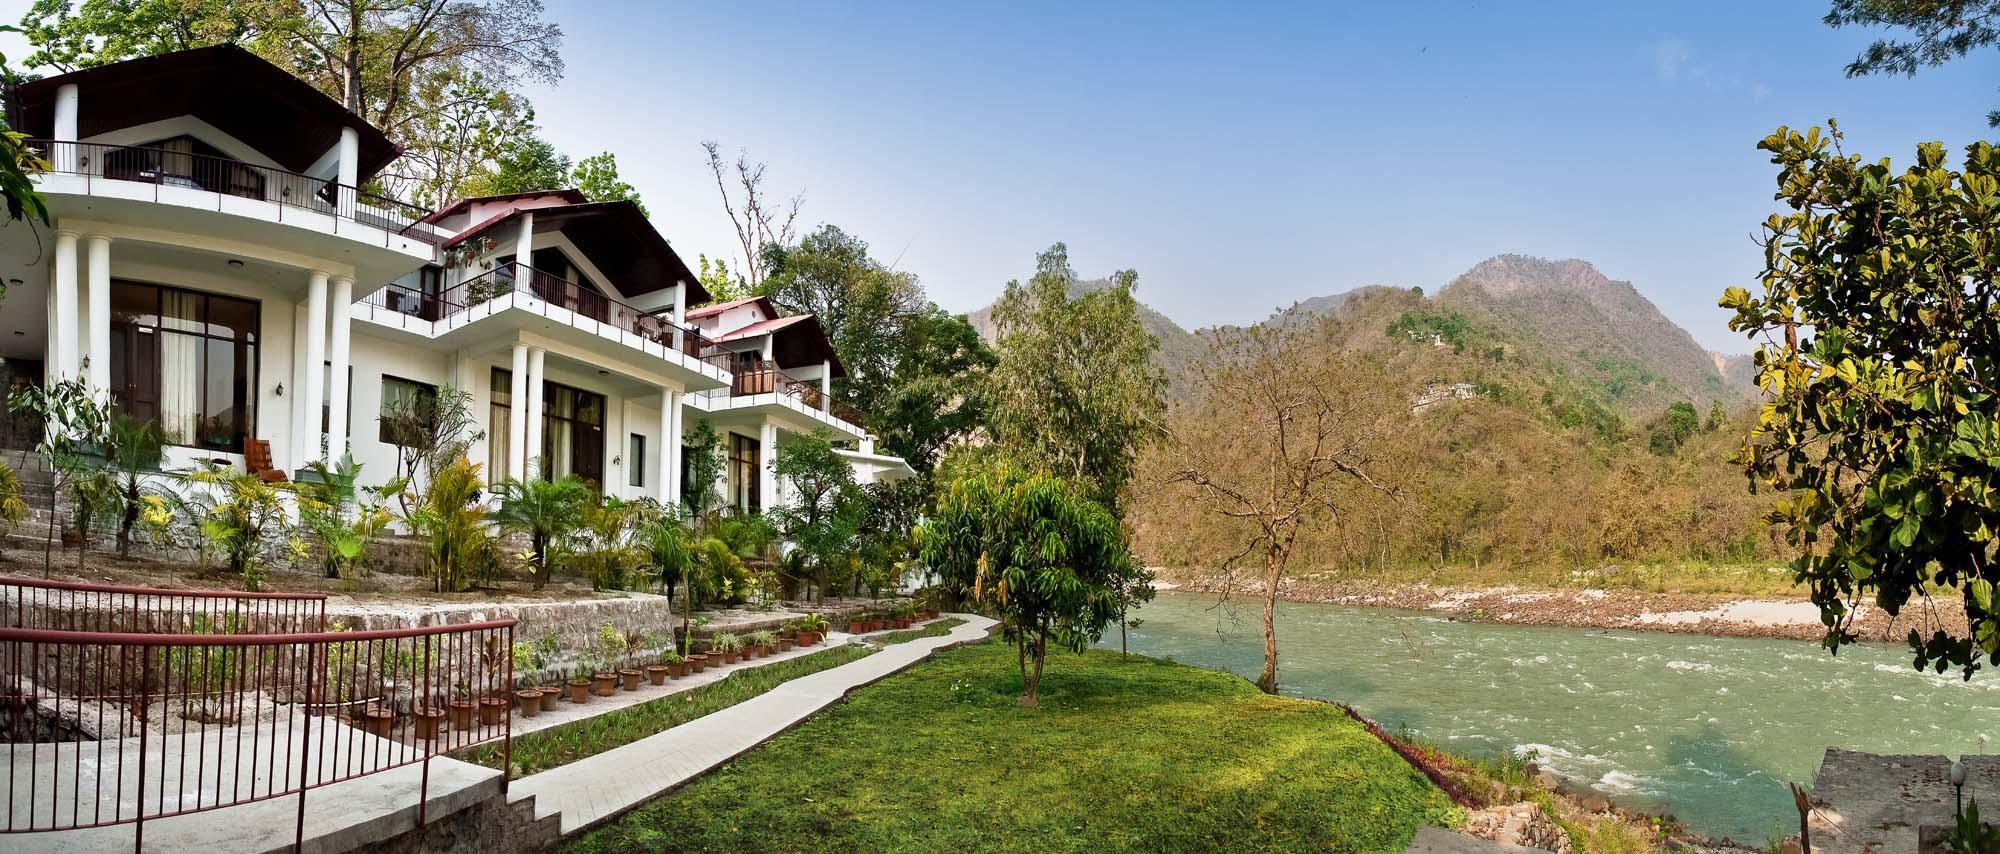 Neemrana's Glasshouse On The Ganges